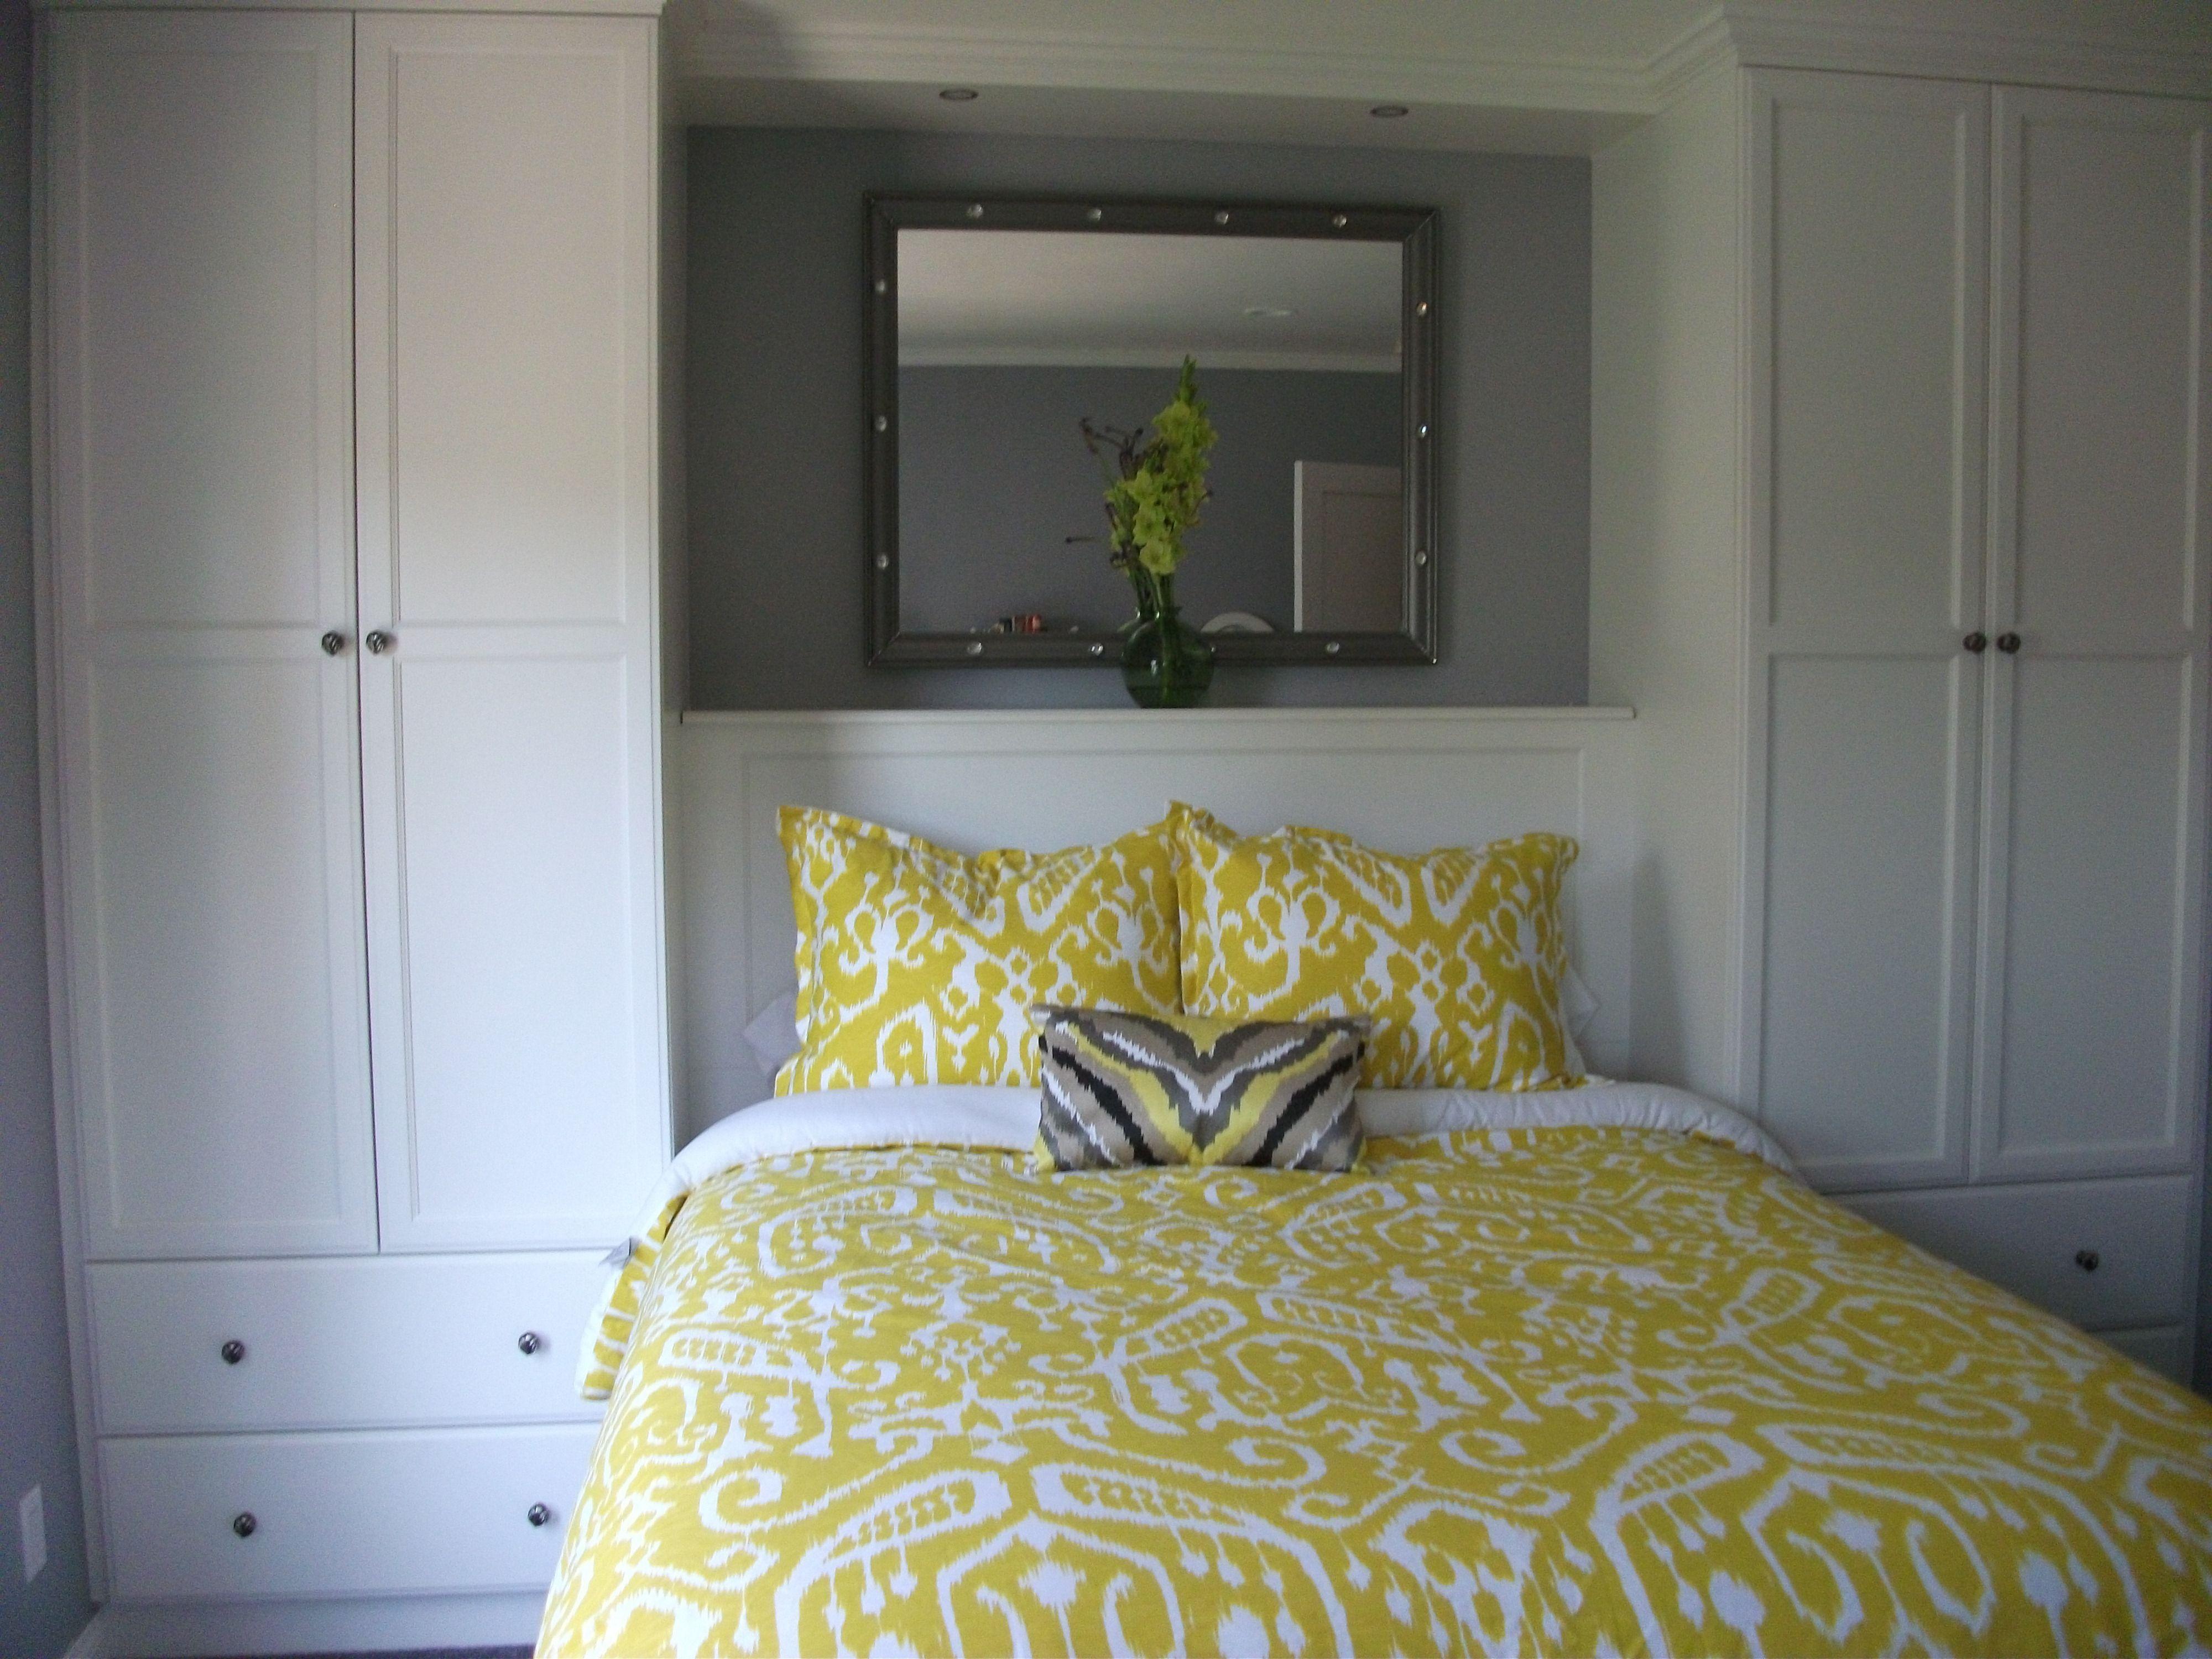 Built In Headboard And Bed Surround Closet Remodel Bedroom Bedroom Decor Design Small Master Bedroom